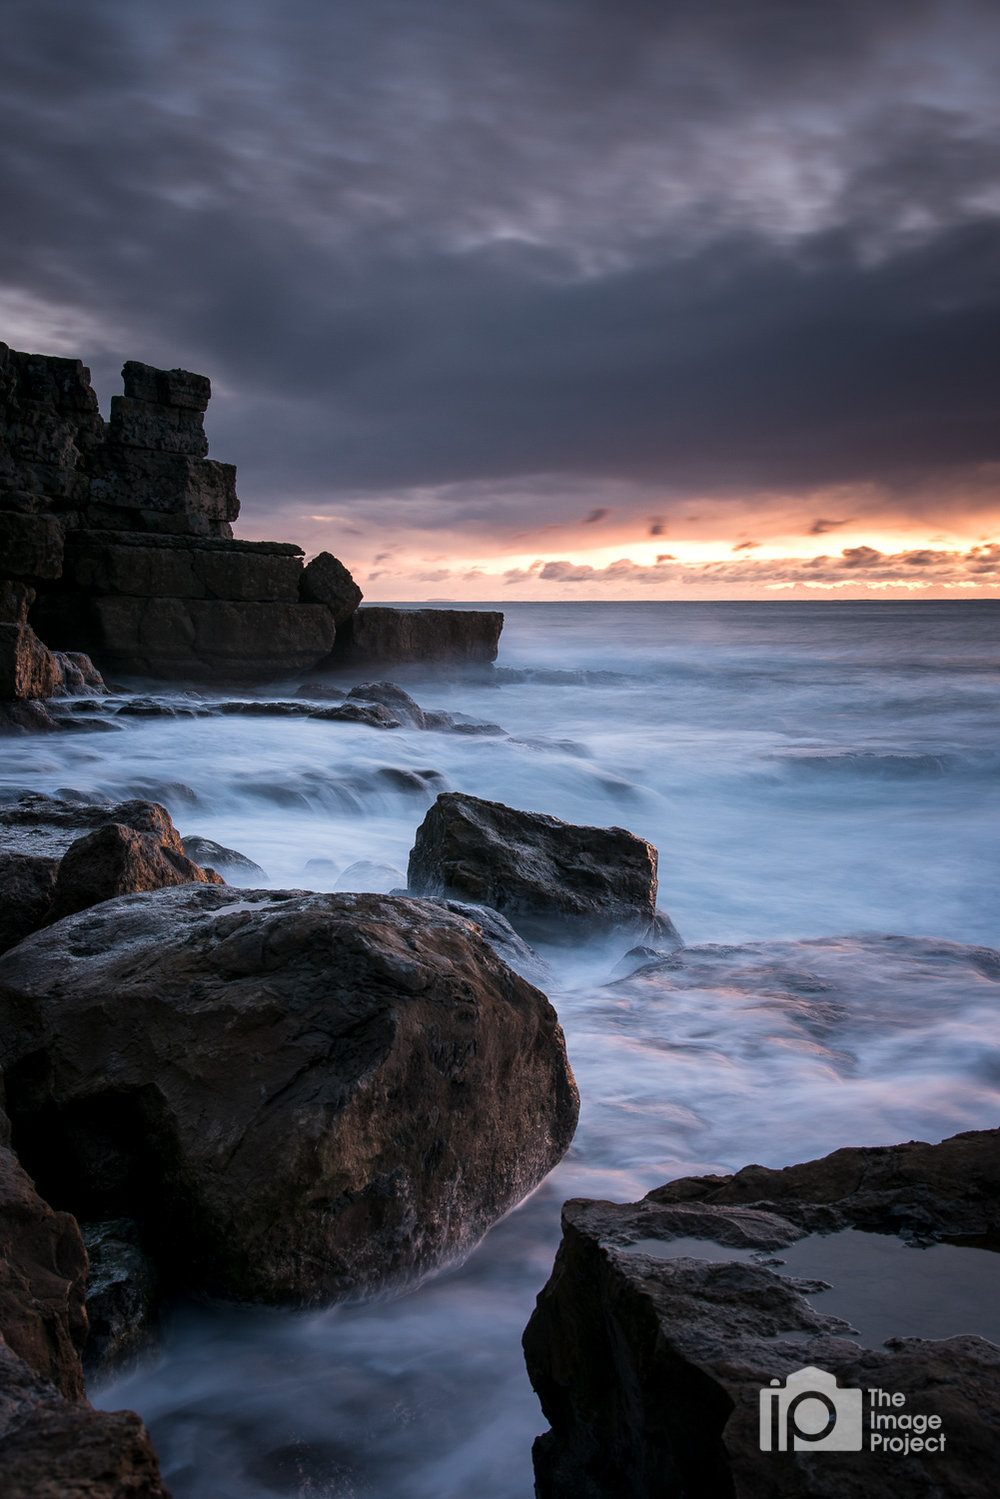 Morning Light at Cove, Dorset